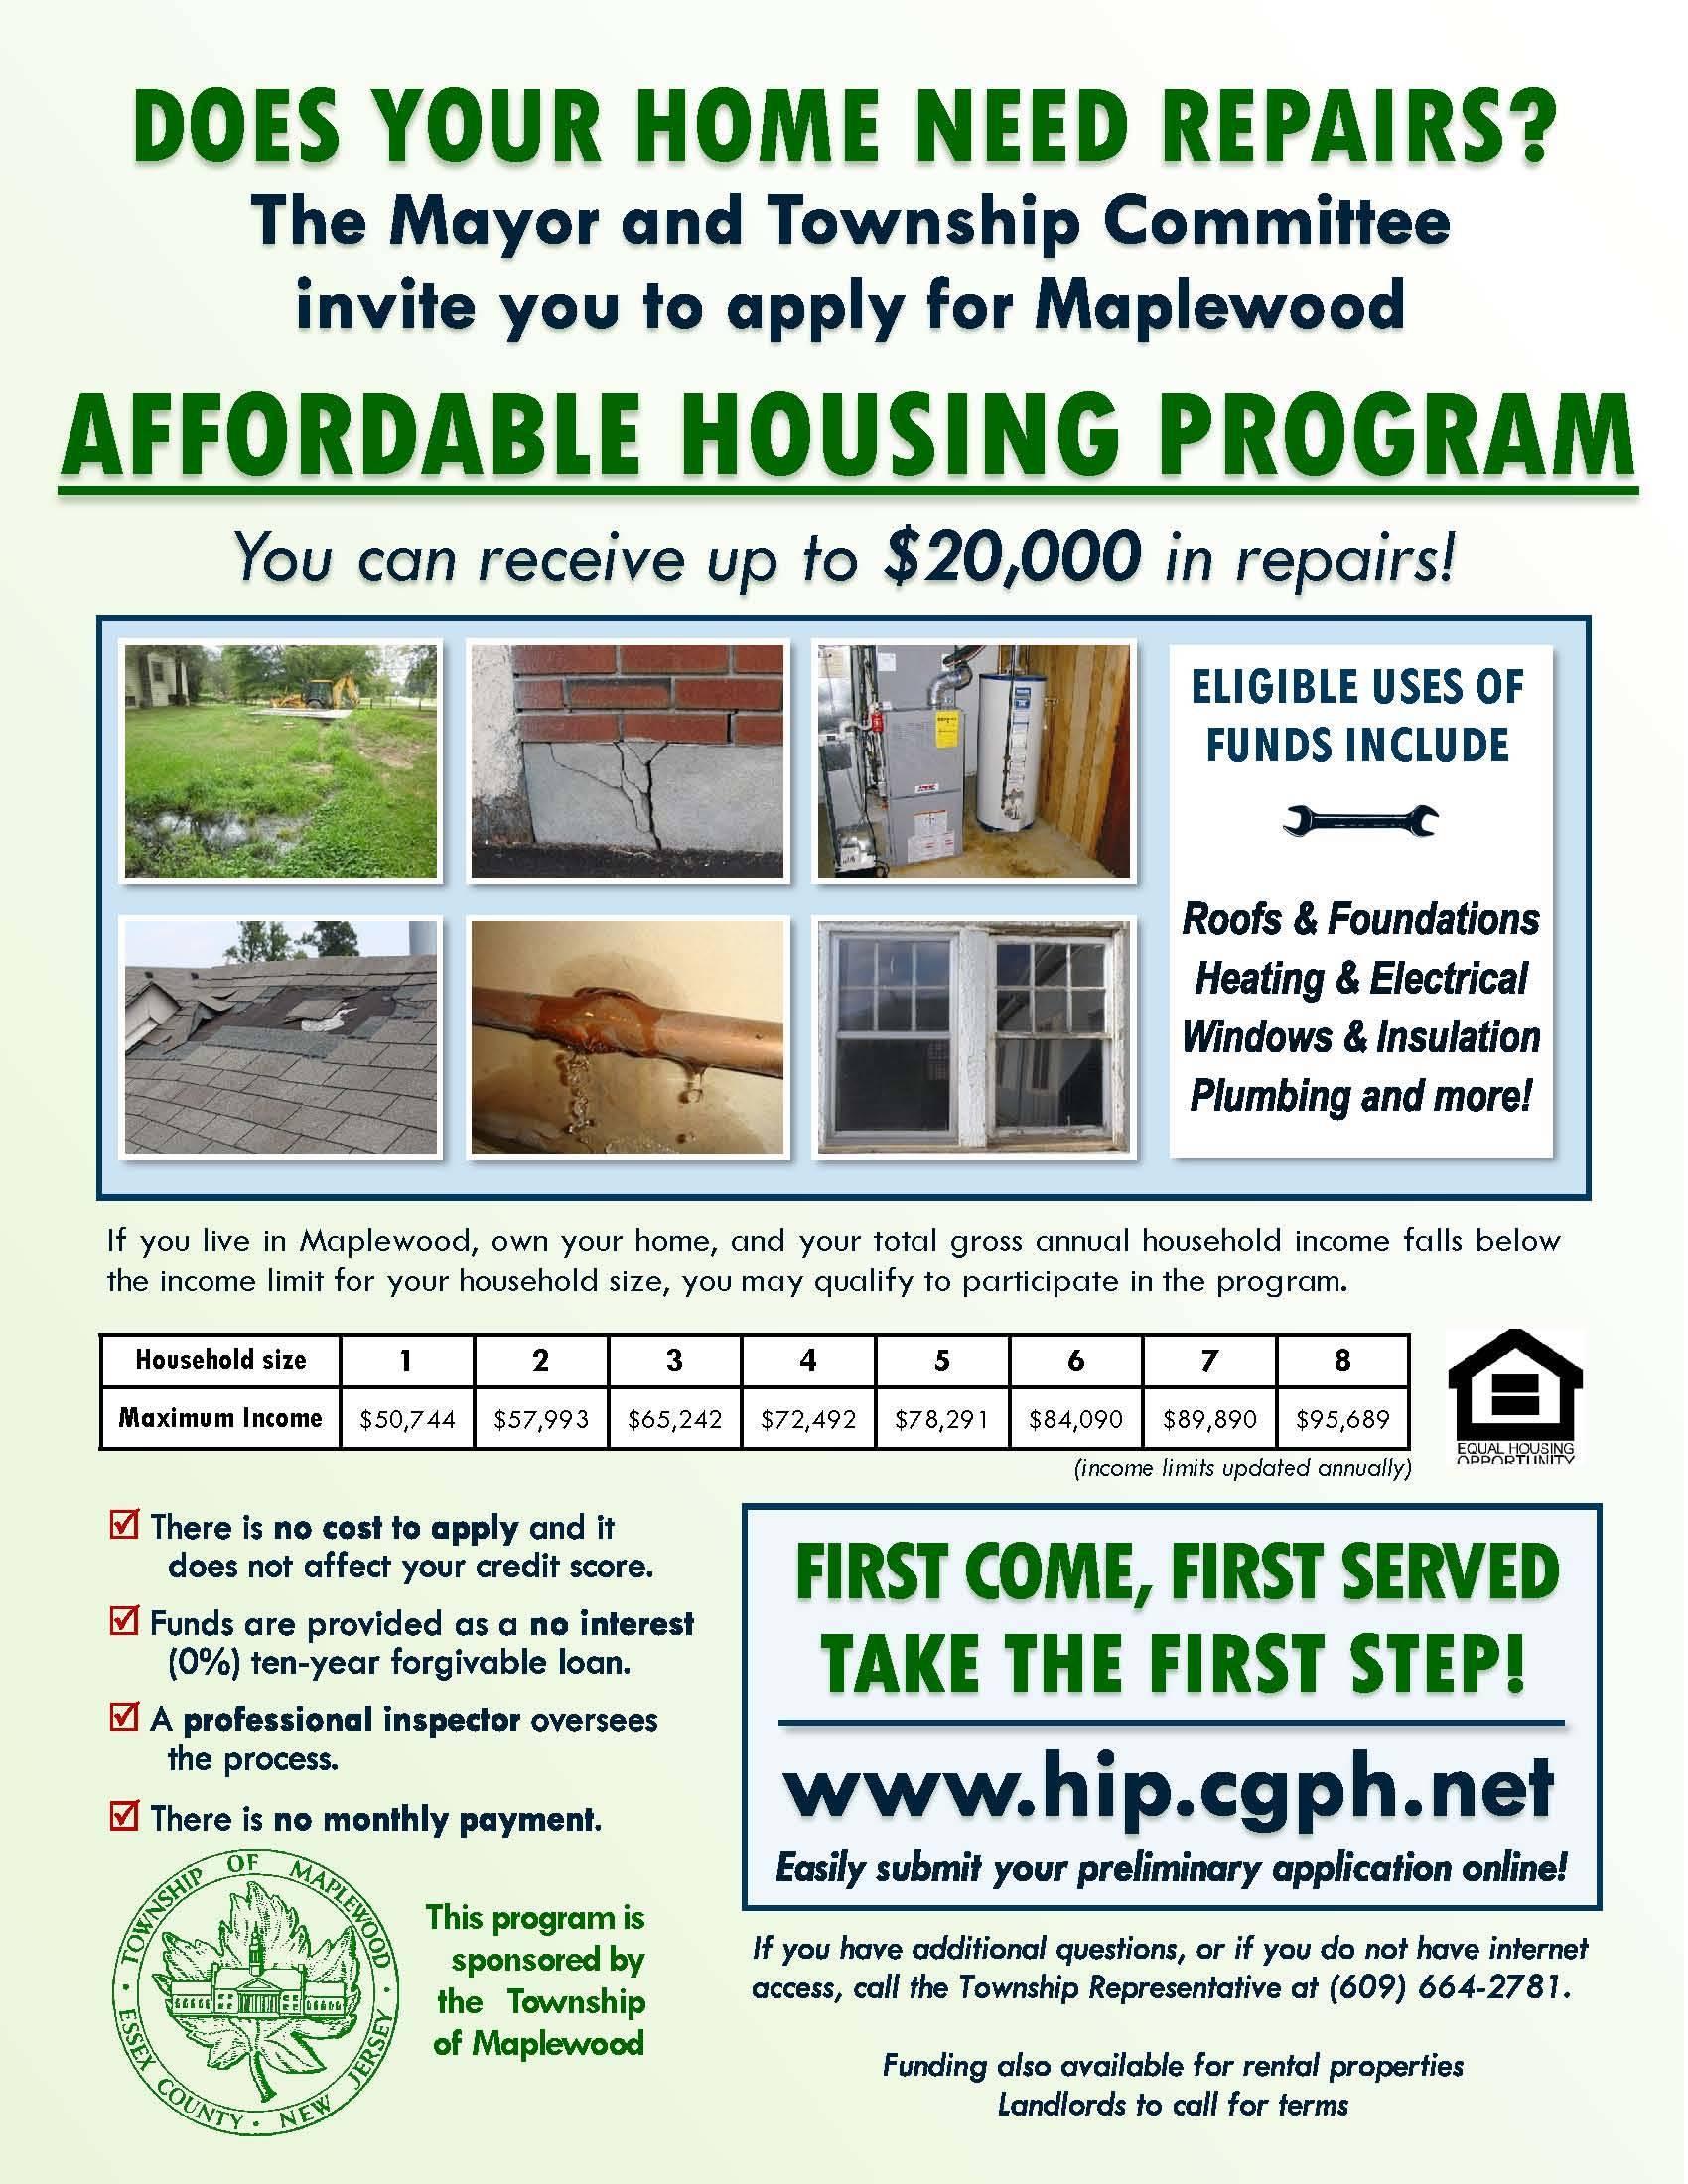 018c0699559532c476db_Affordable_Housing_Maplewood_flyer_2017.jpg